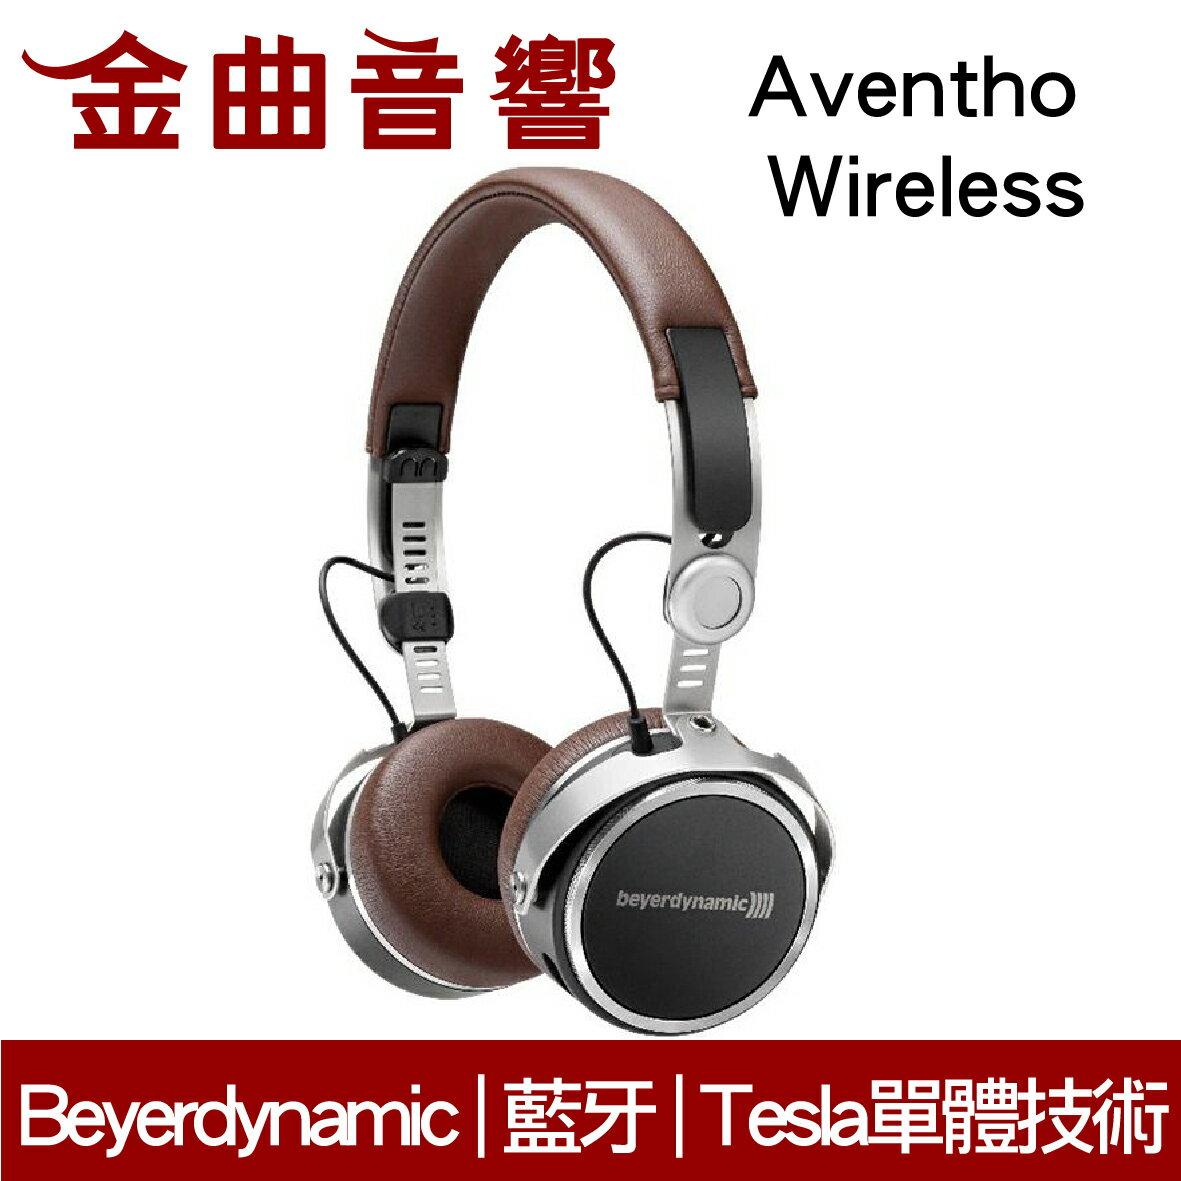 Beyerdynamic 拜耳 Aventho Wireless 棕色 無線 藍牙 耳罩式耳機 | 金曲音響